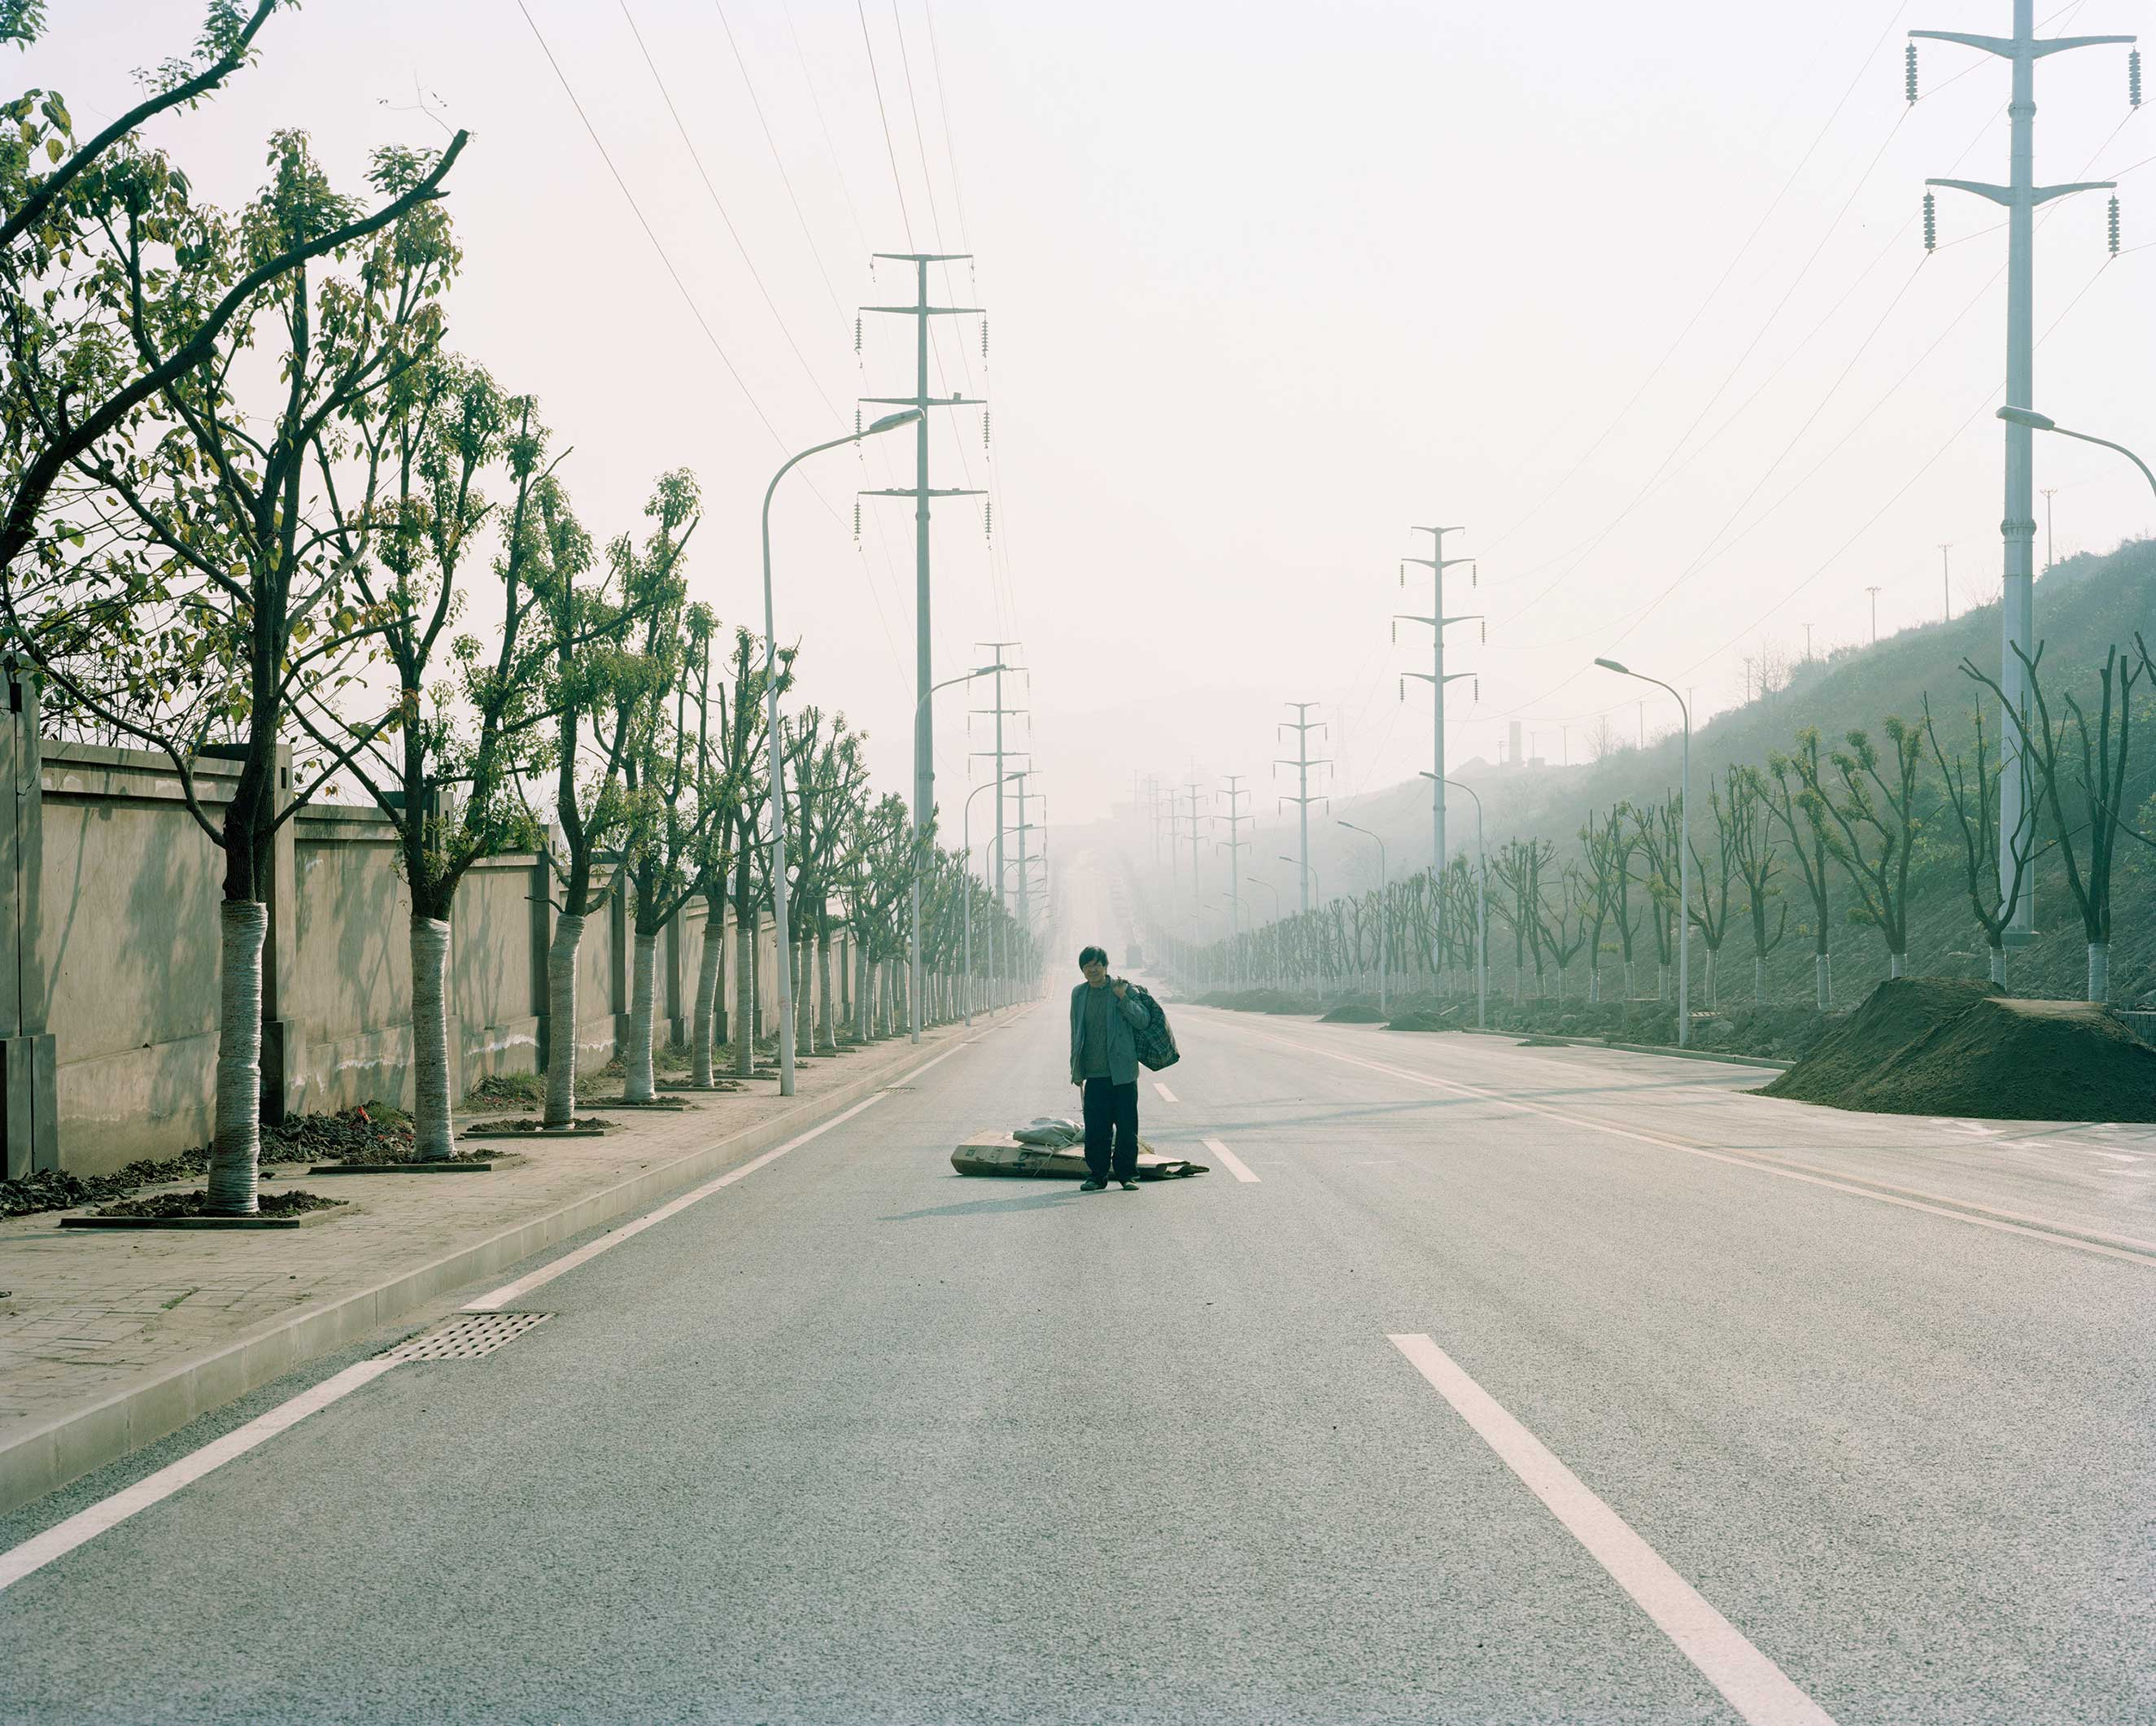 Wan Zhou, China, January 2015. Industrial area.